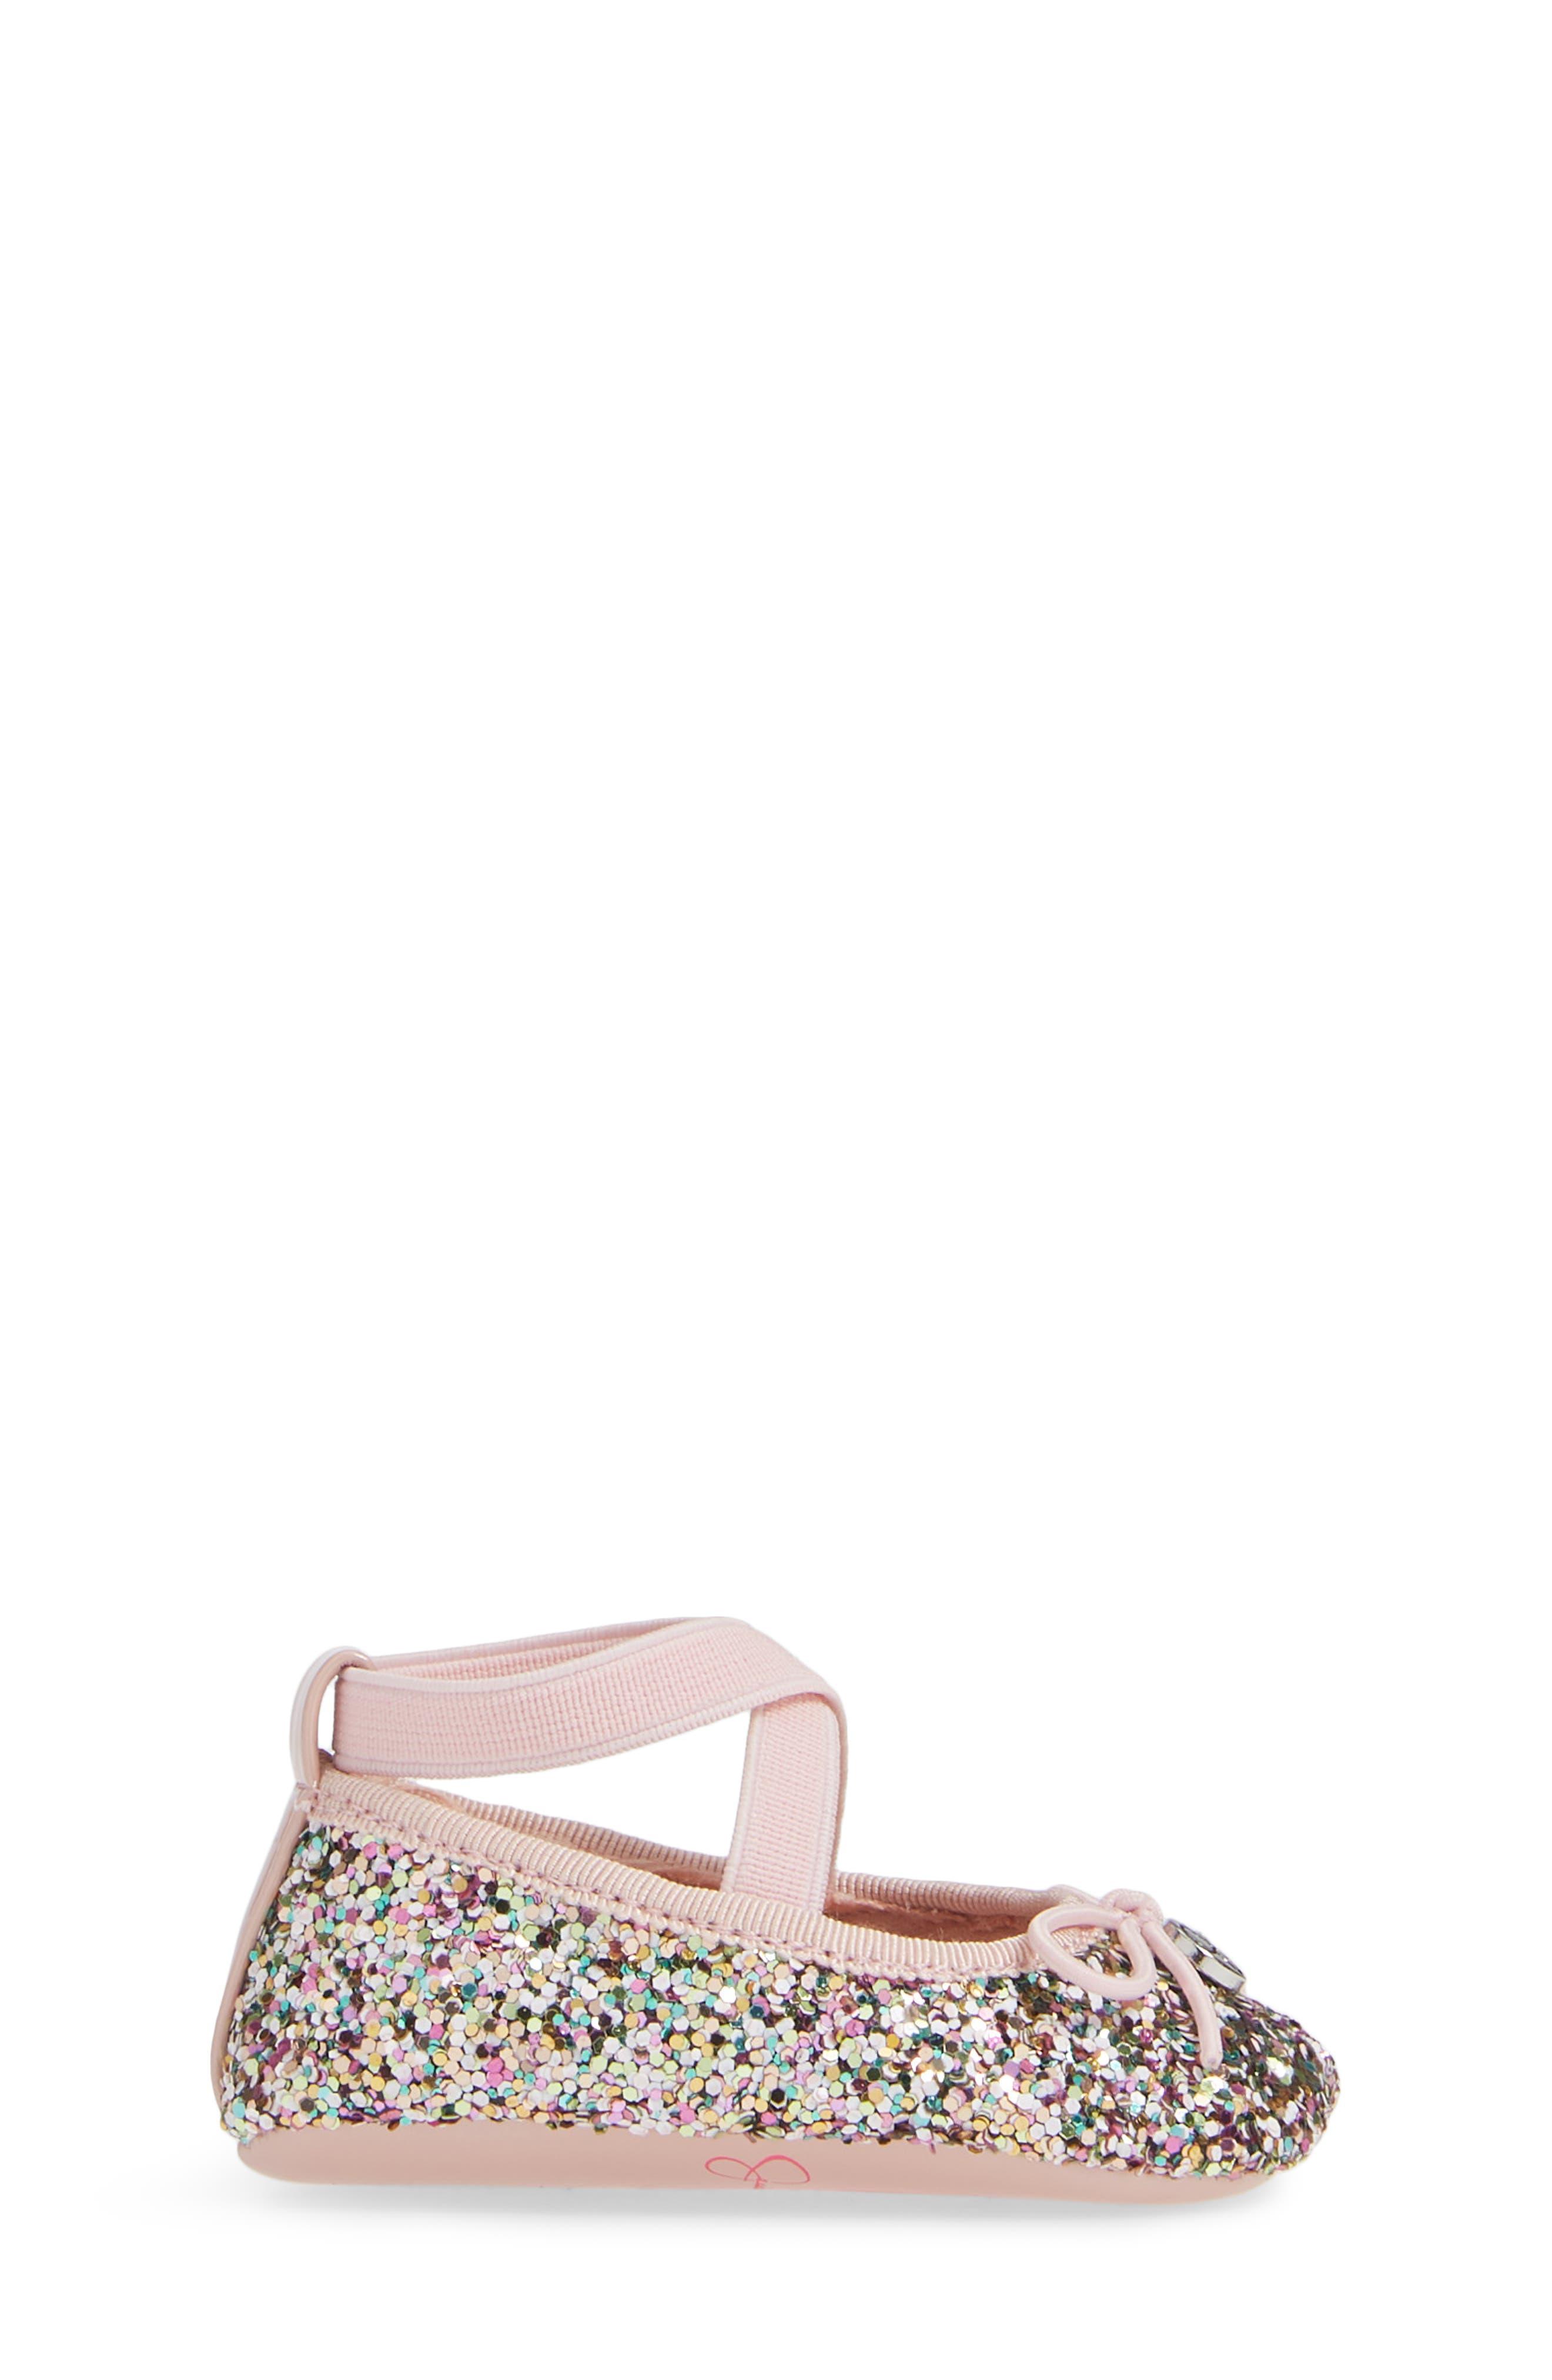 JESSICA SIMPSON, Glitter Mary Jane Crib Shoe, Alternate thumbnail 3, color, 650